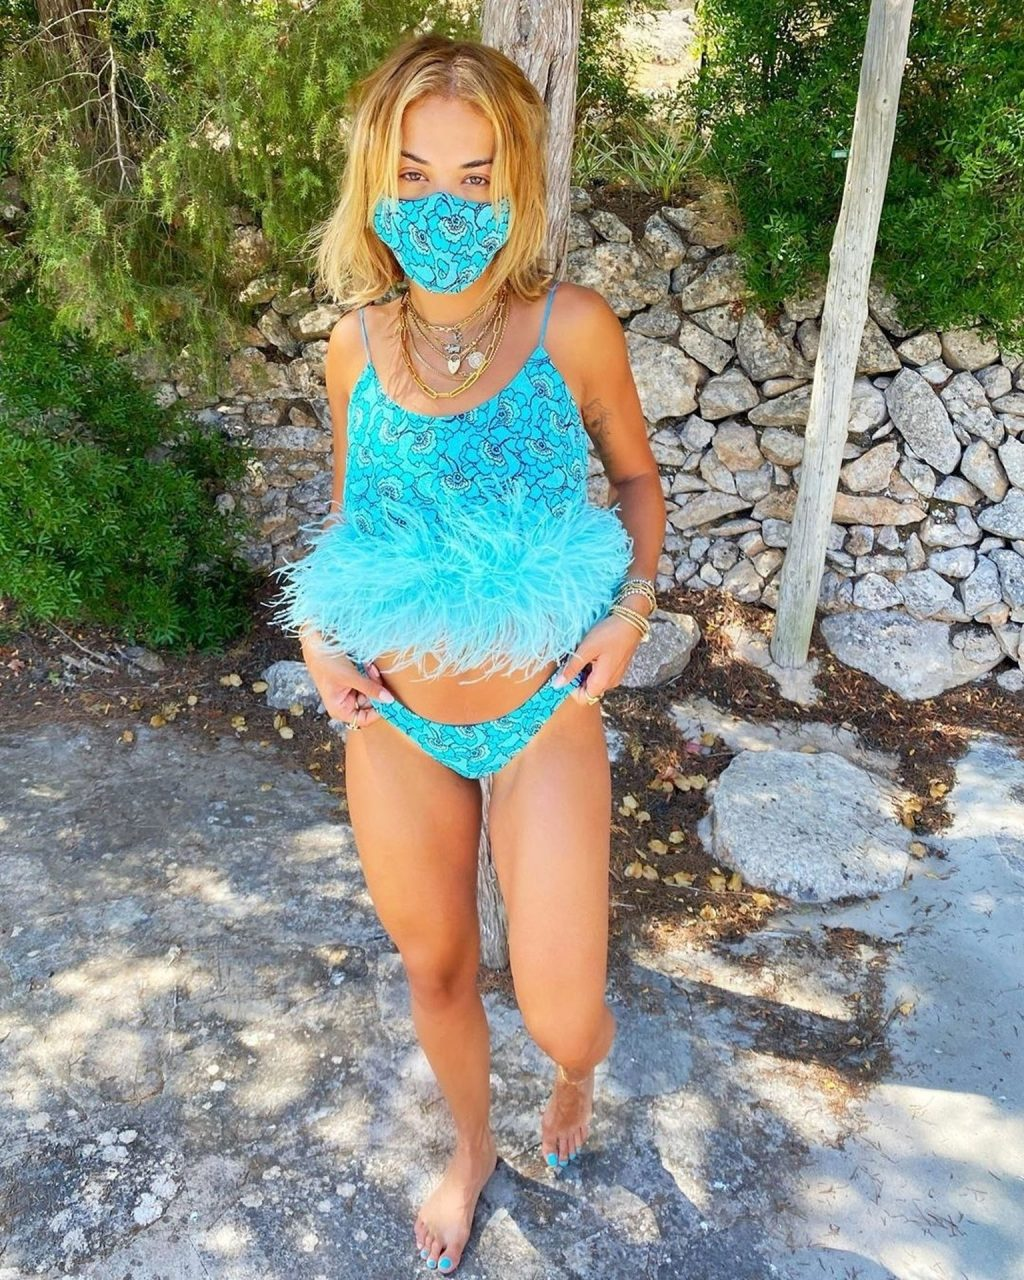 Sexy Rita Ora Poses in a Turquoise Bikini (5 Photos)